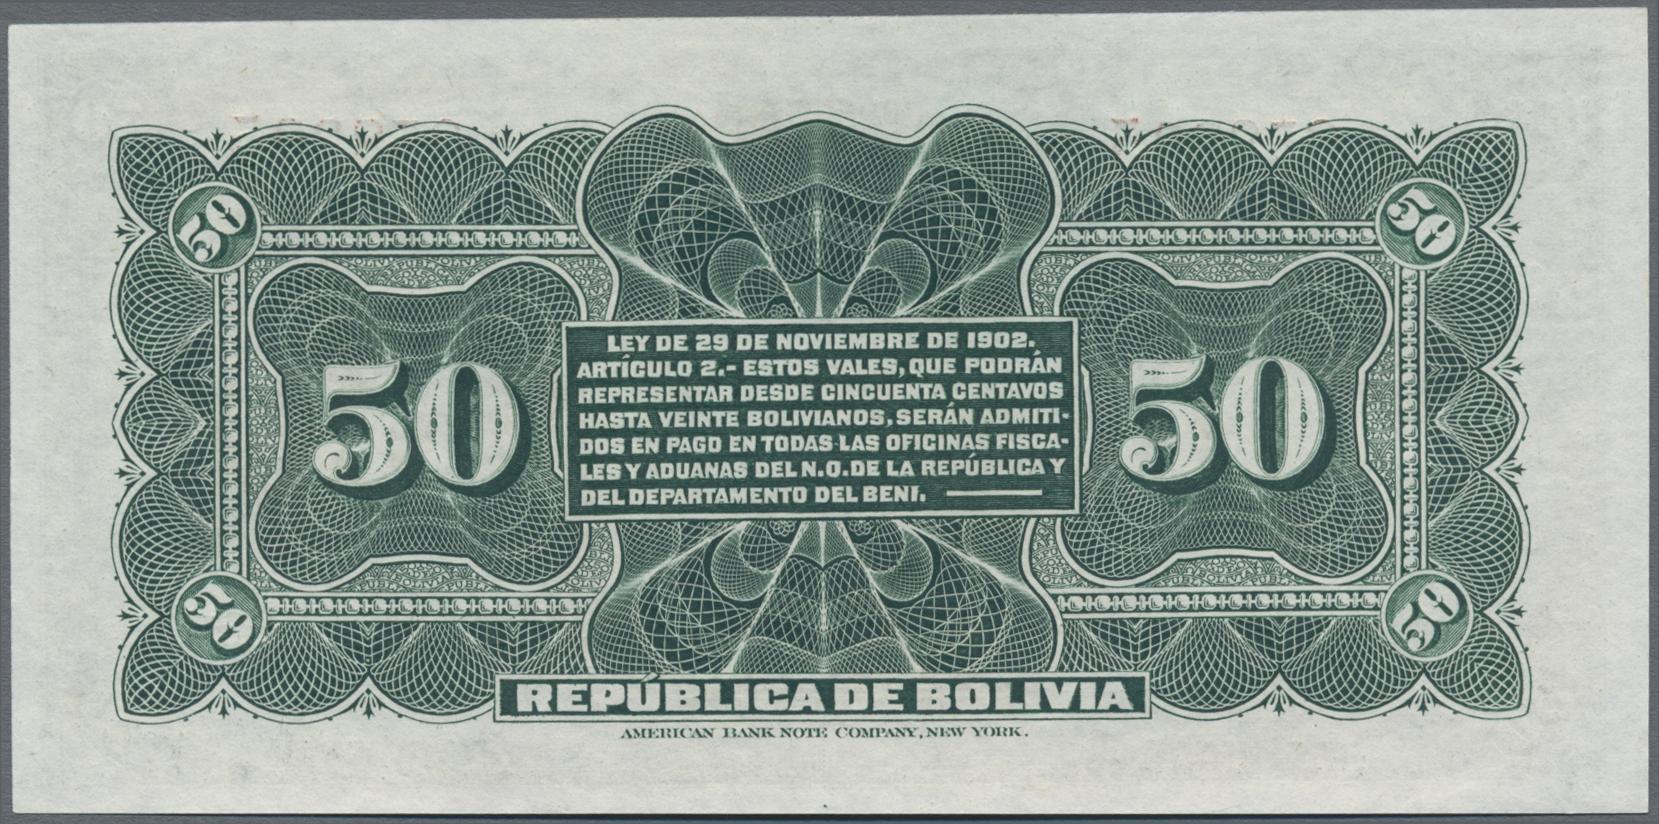 Lot 00062 - Bolivia / Bolivien | Banknoten  -  Auktionshaus Christoph Gärtner GmbH & Co. KG Sale #48 The Banknotes